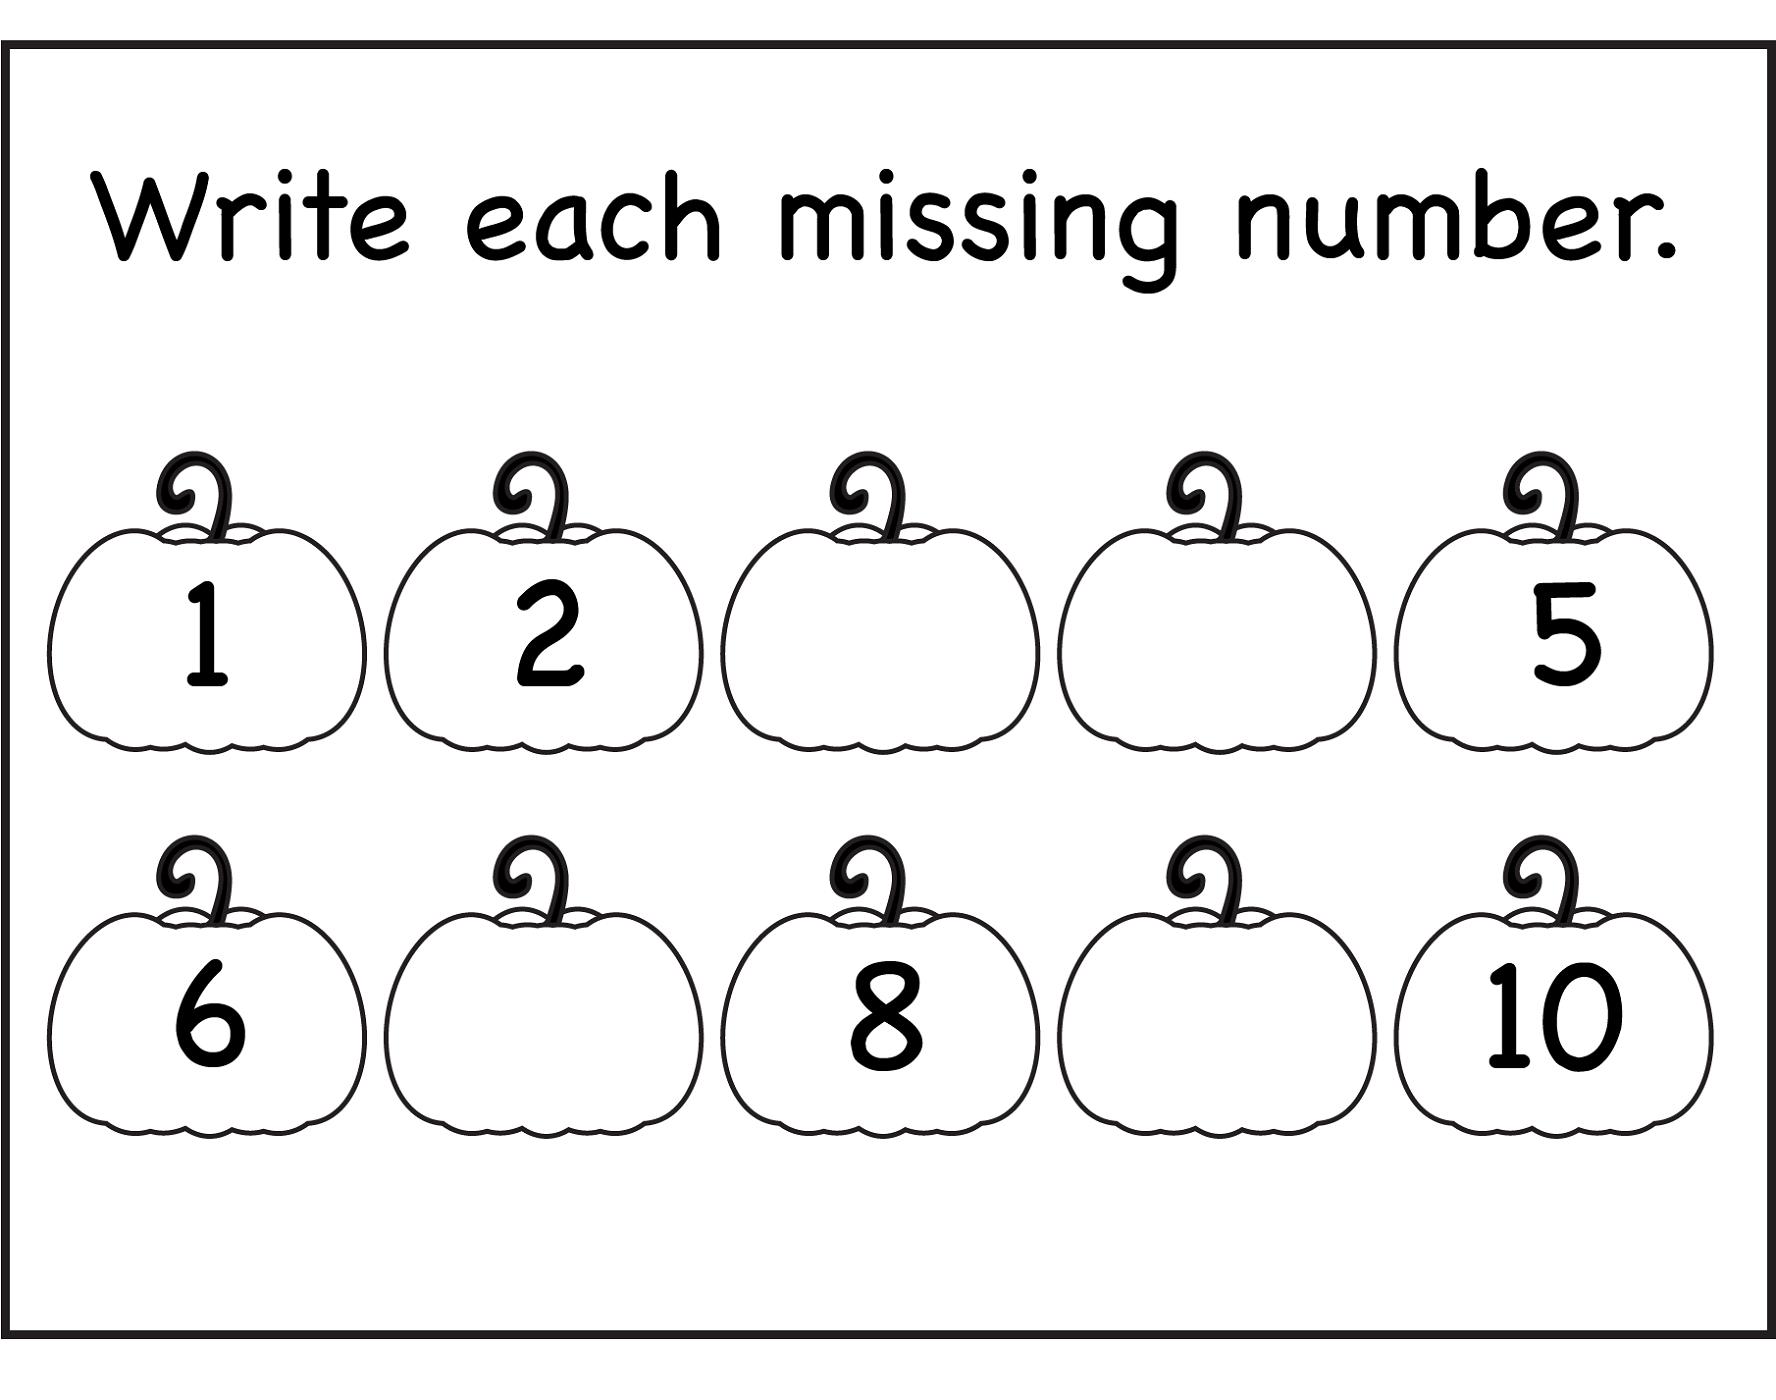 60 Tracing Numbers 1 10 Workshets Kindergarten Number Worksheets 8 Or Number Tracing Worksheets 1 20